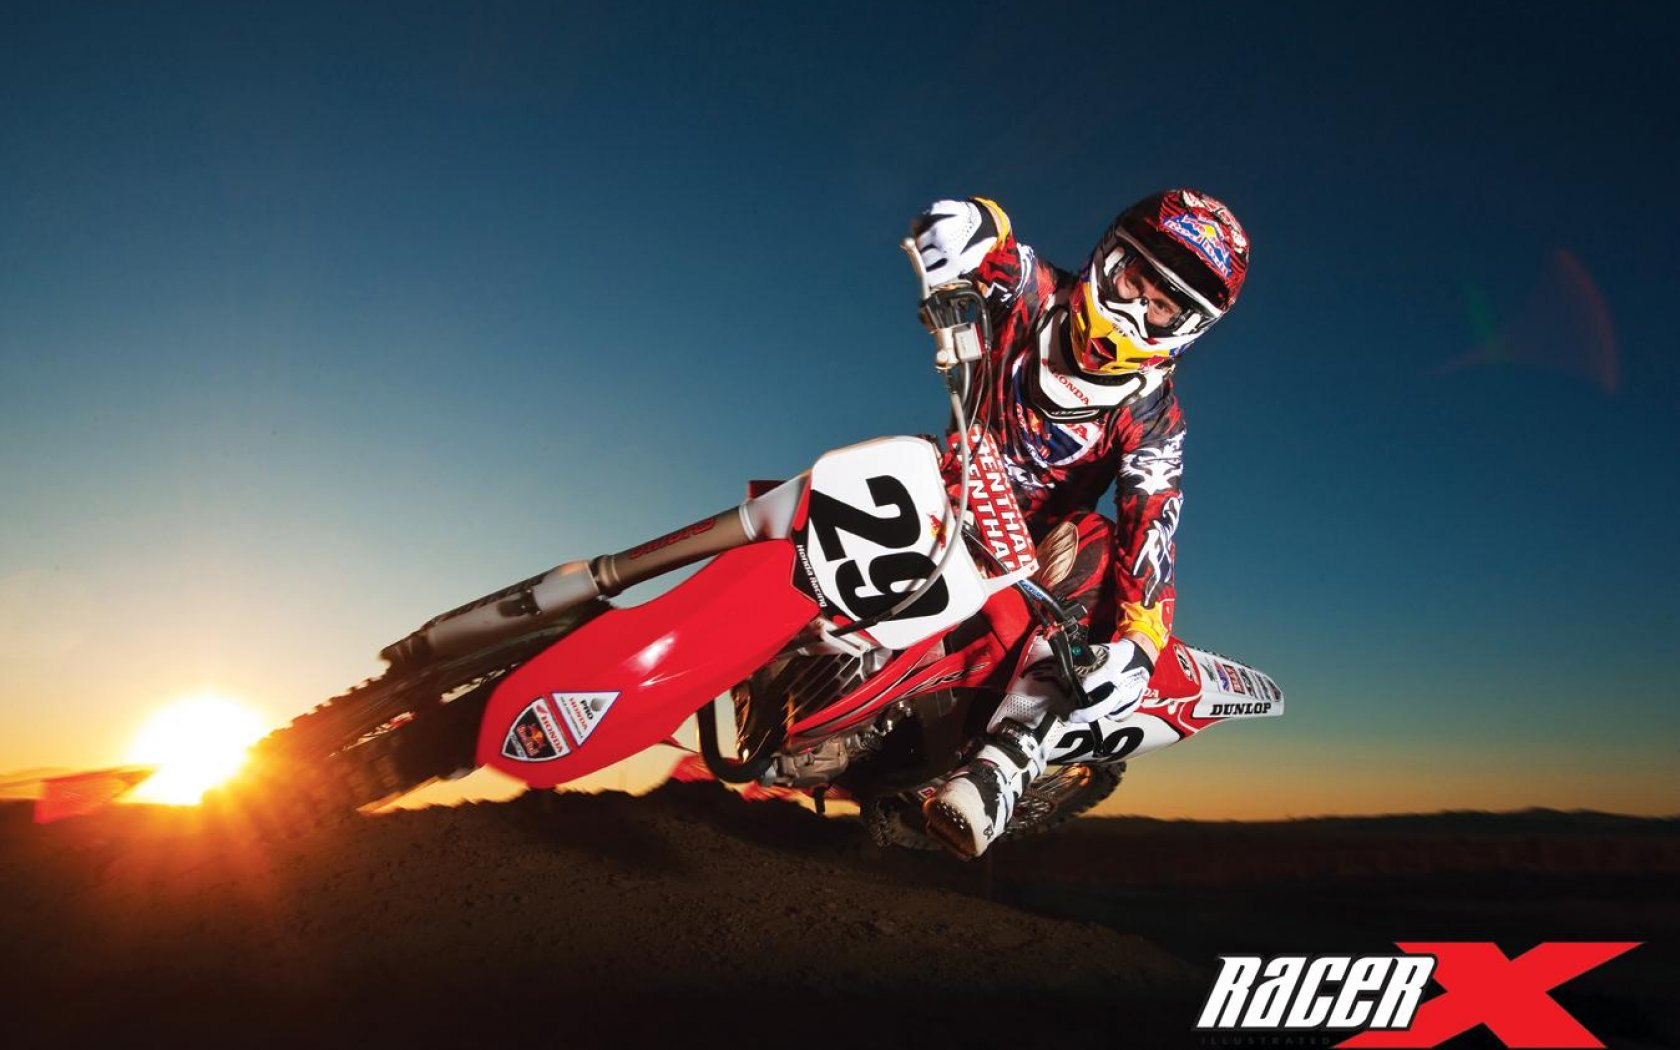 Motocross racing wallpaper